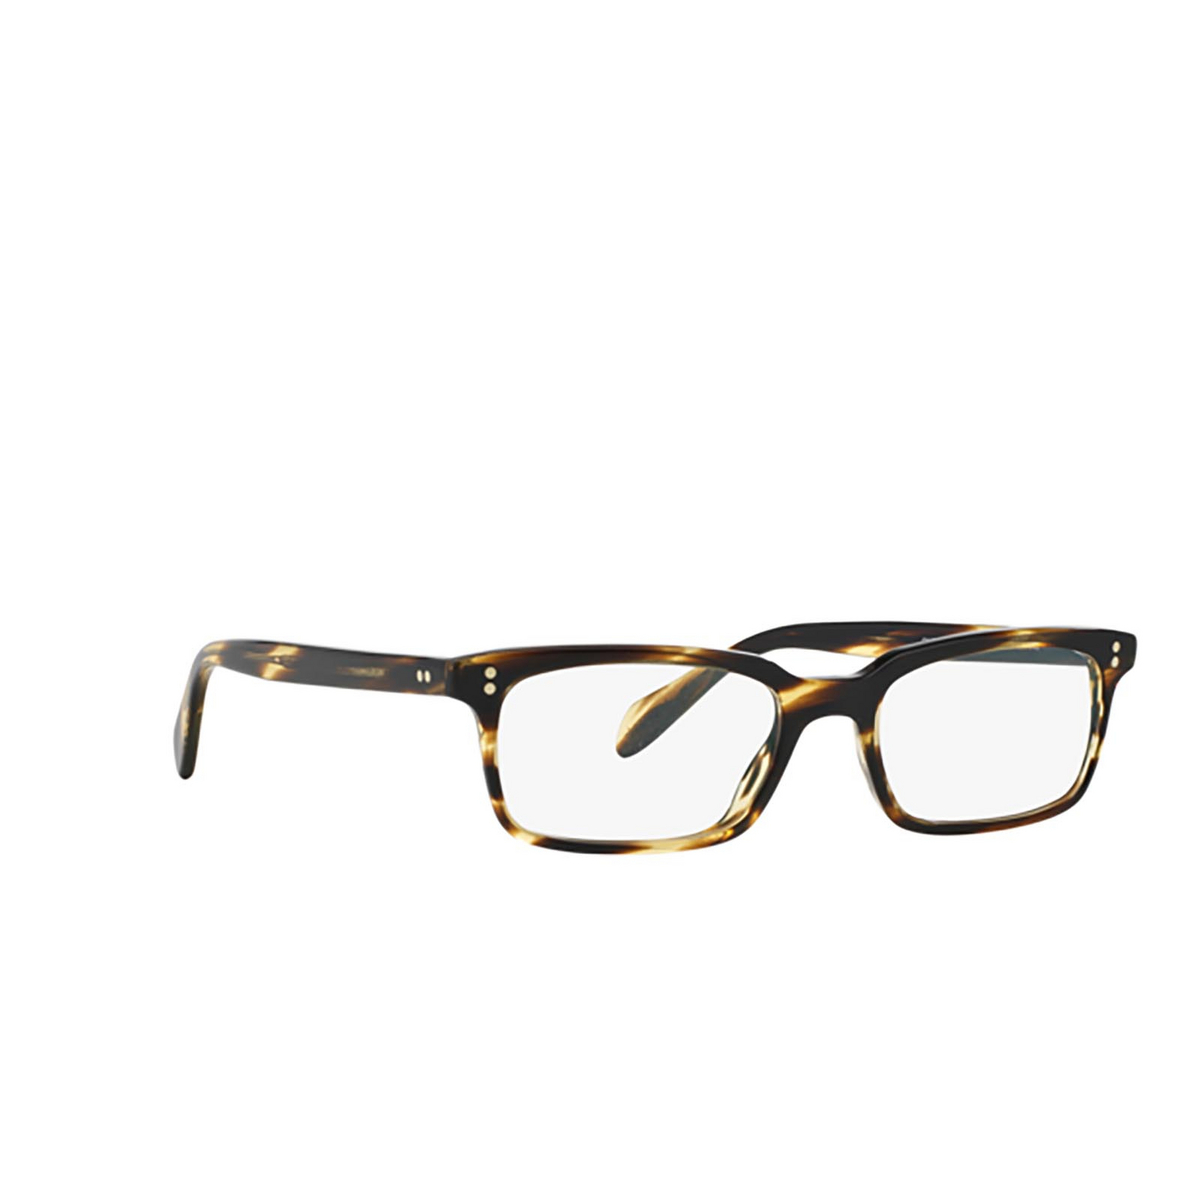 Oliver Peoples® Rectangle Eyeglasses: Denison OV5102 color Cocobolo 1003 - three-quarters view.